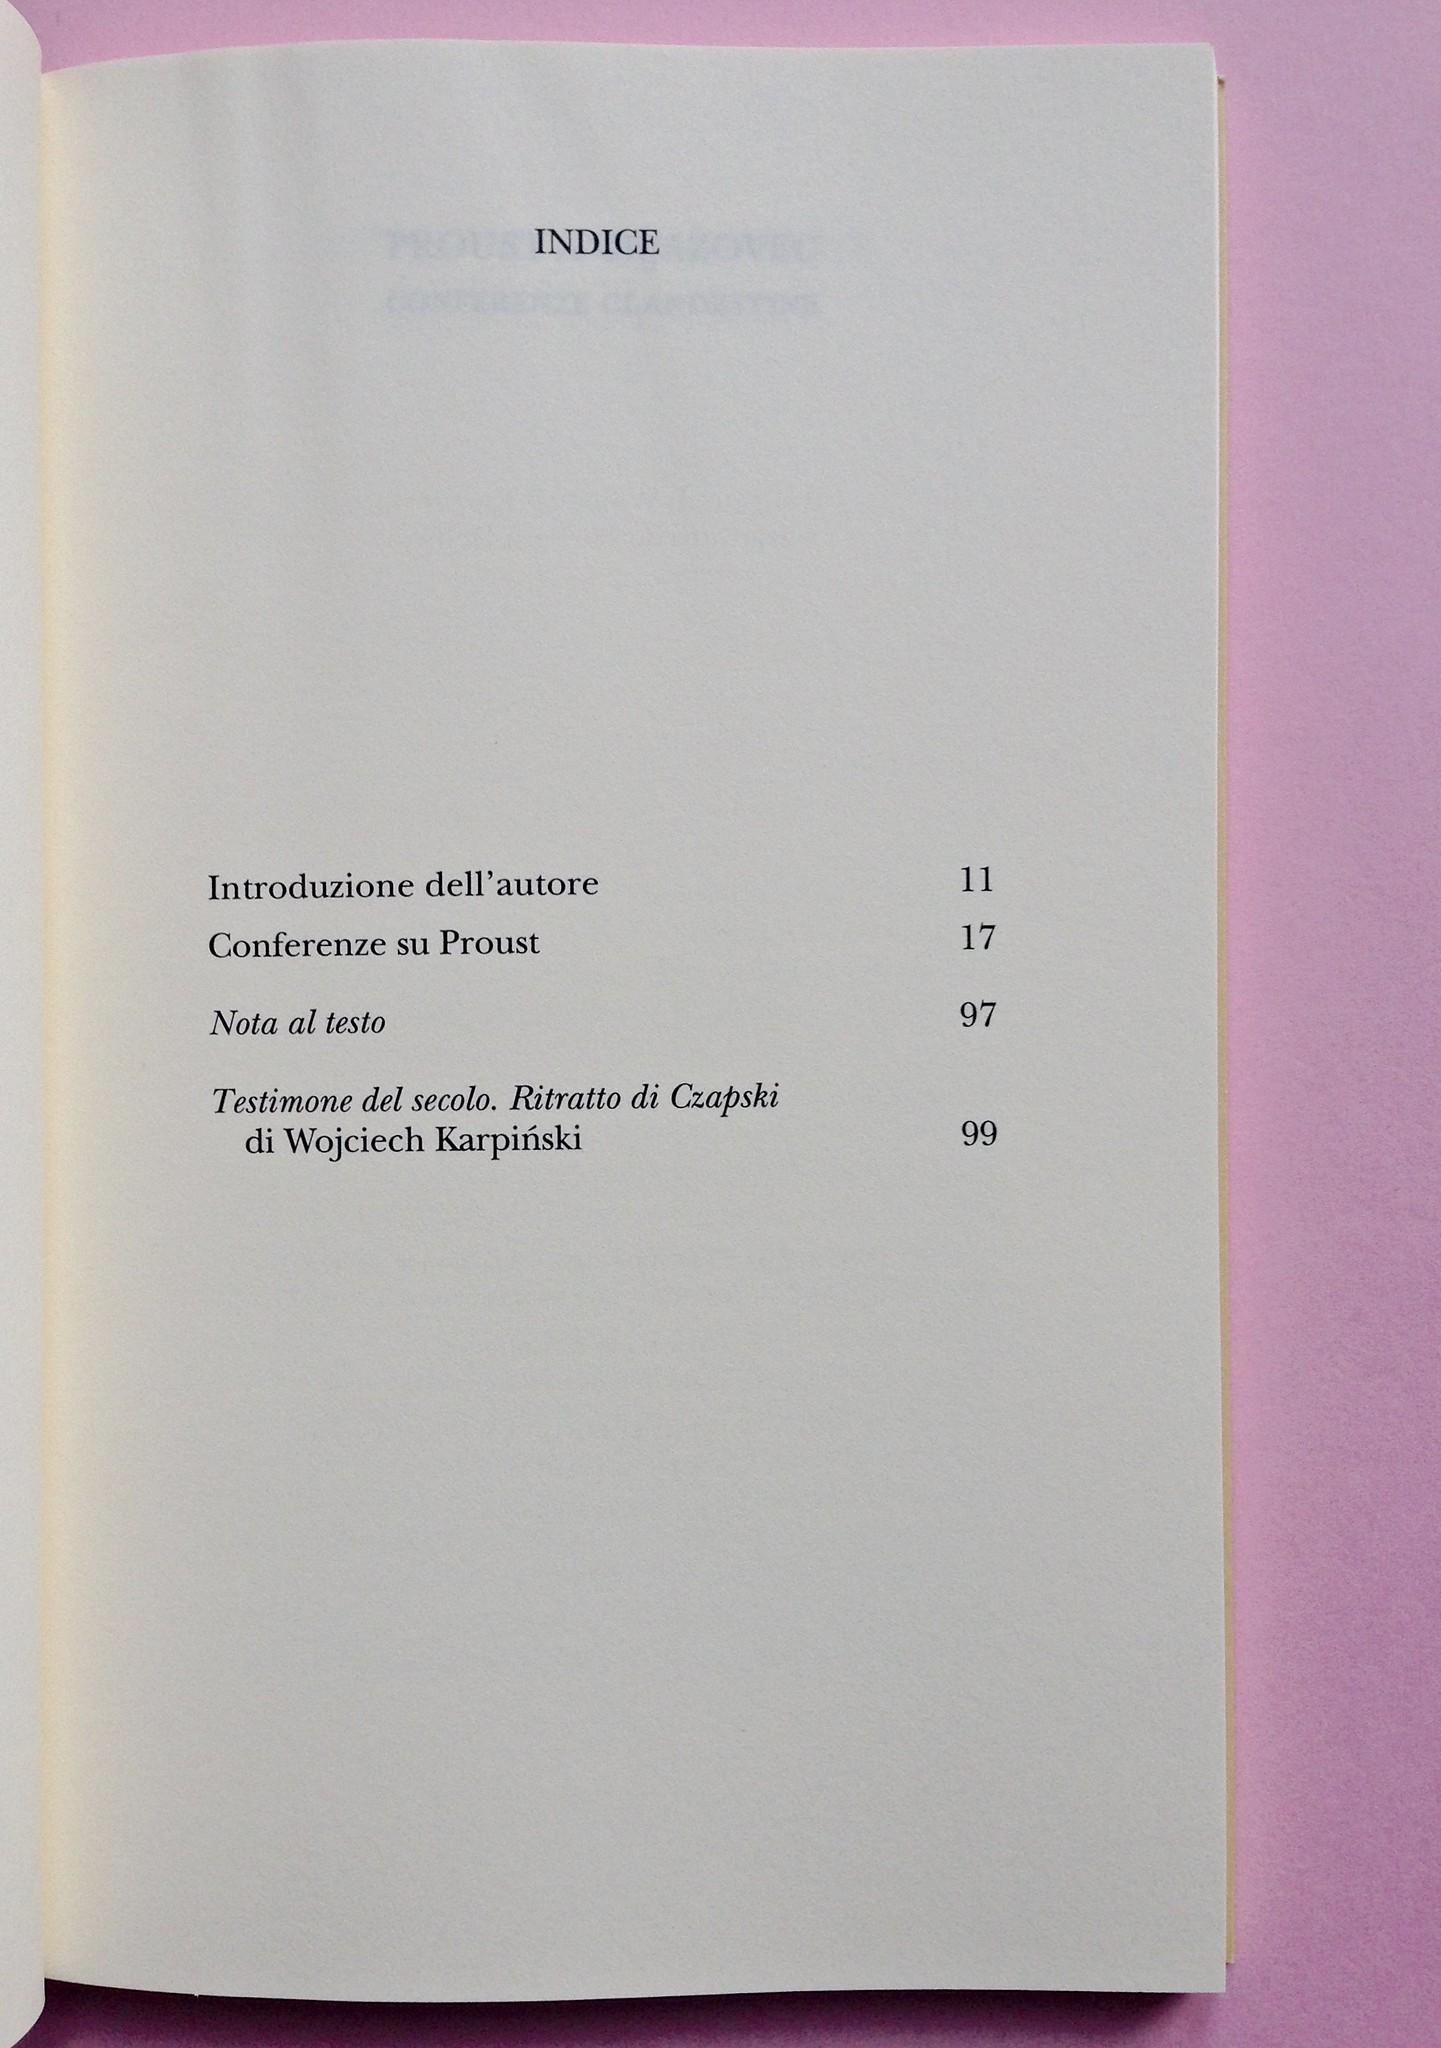 Proust a Grjazovec, di Józef Czapski. Adelphi 2015. Resp. grafica non indicata. Indice, a pag. 7 (part.), 1